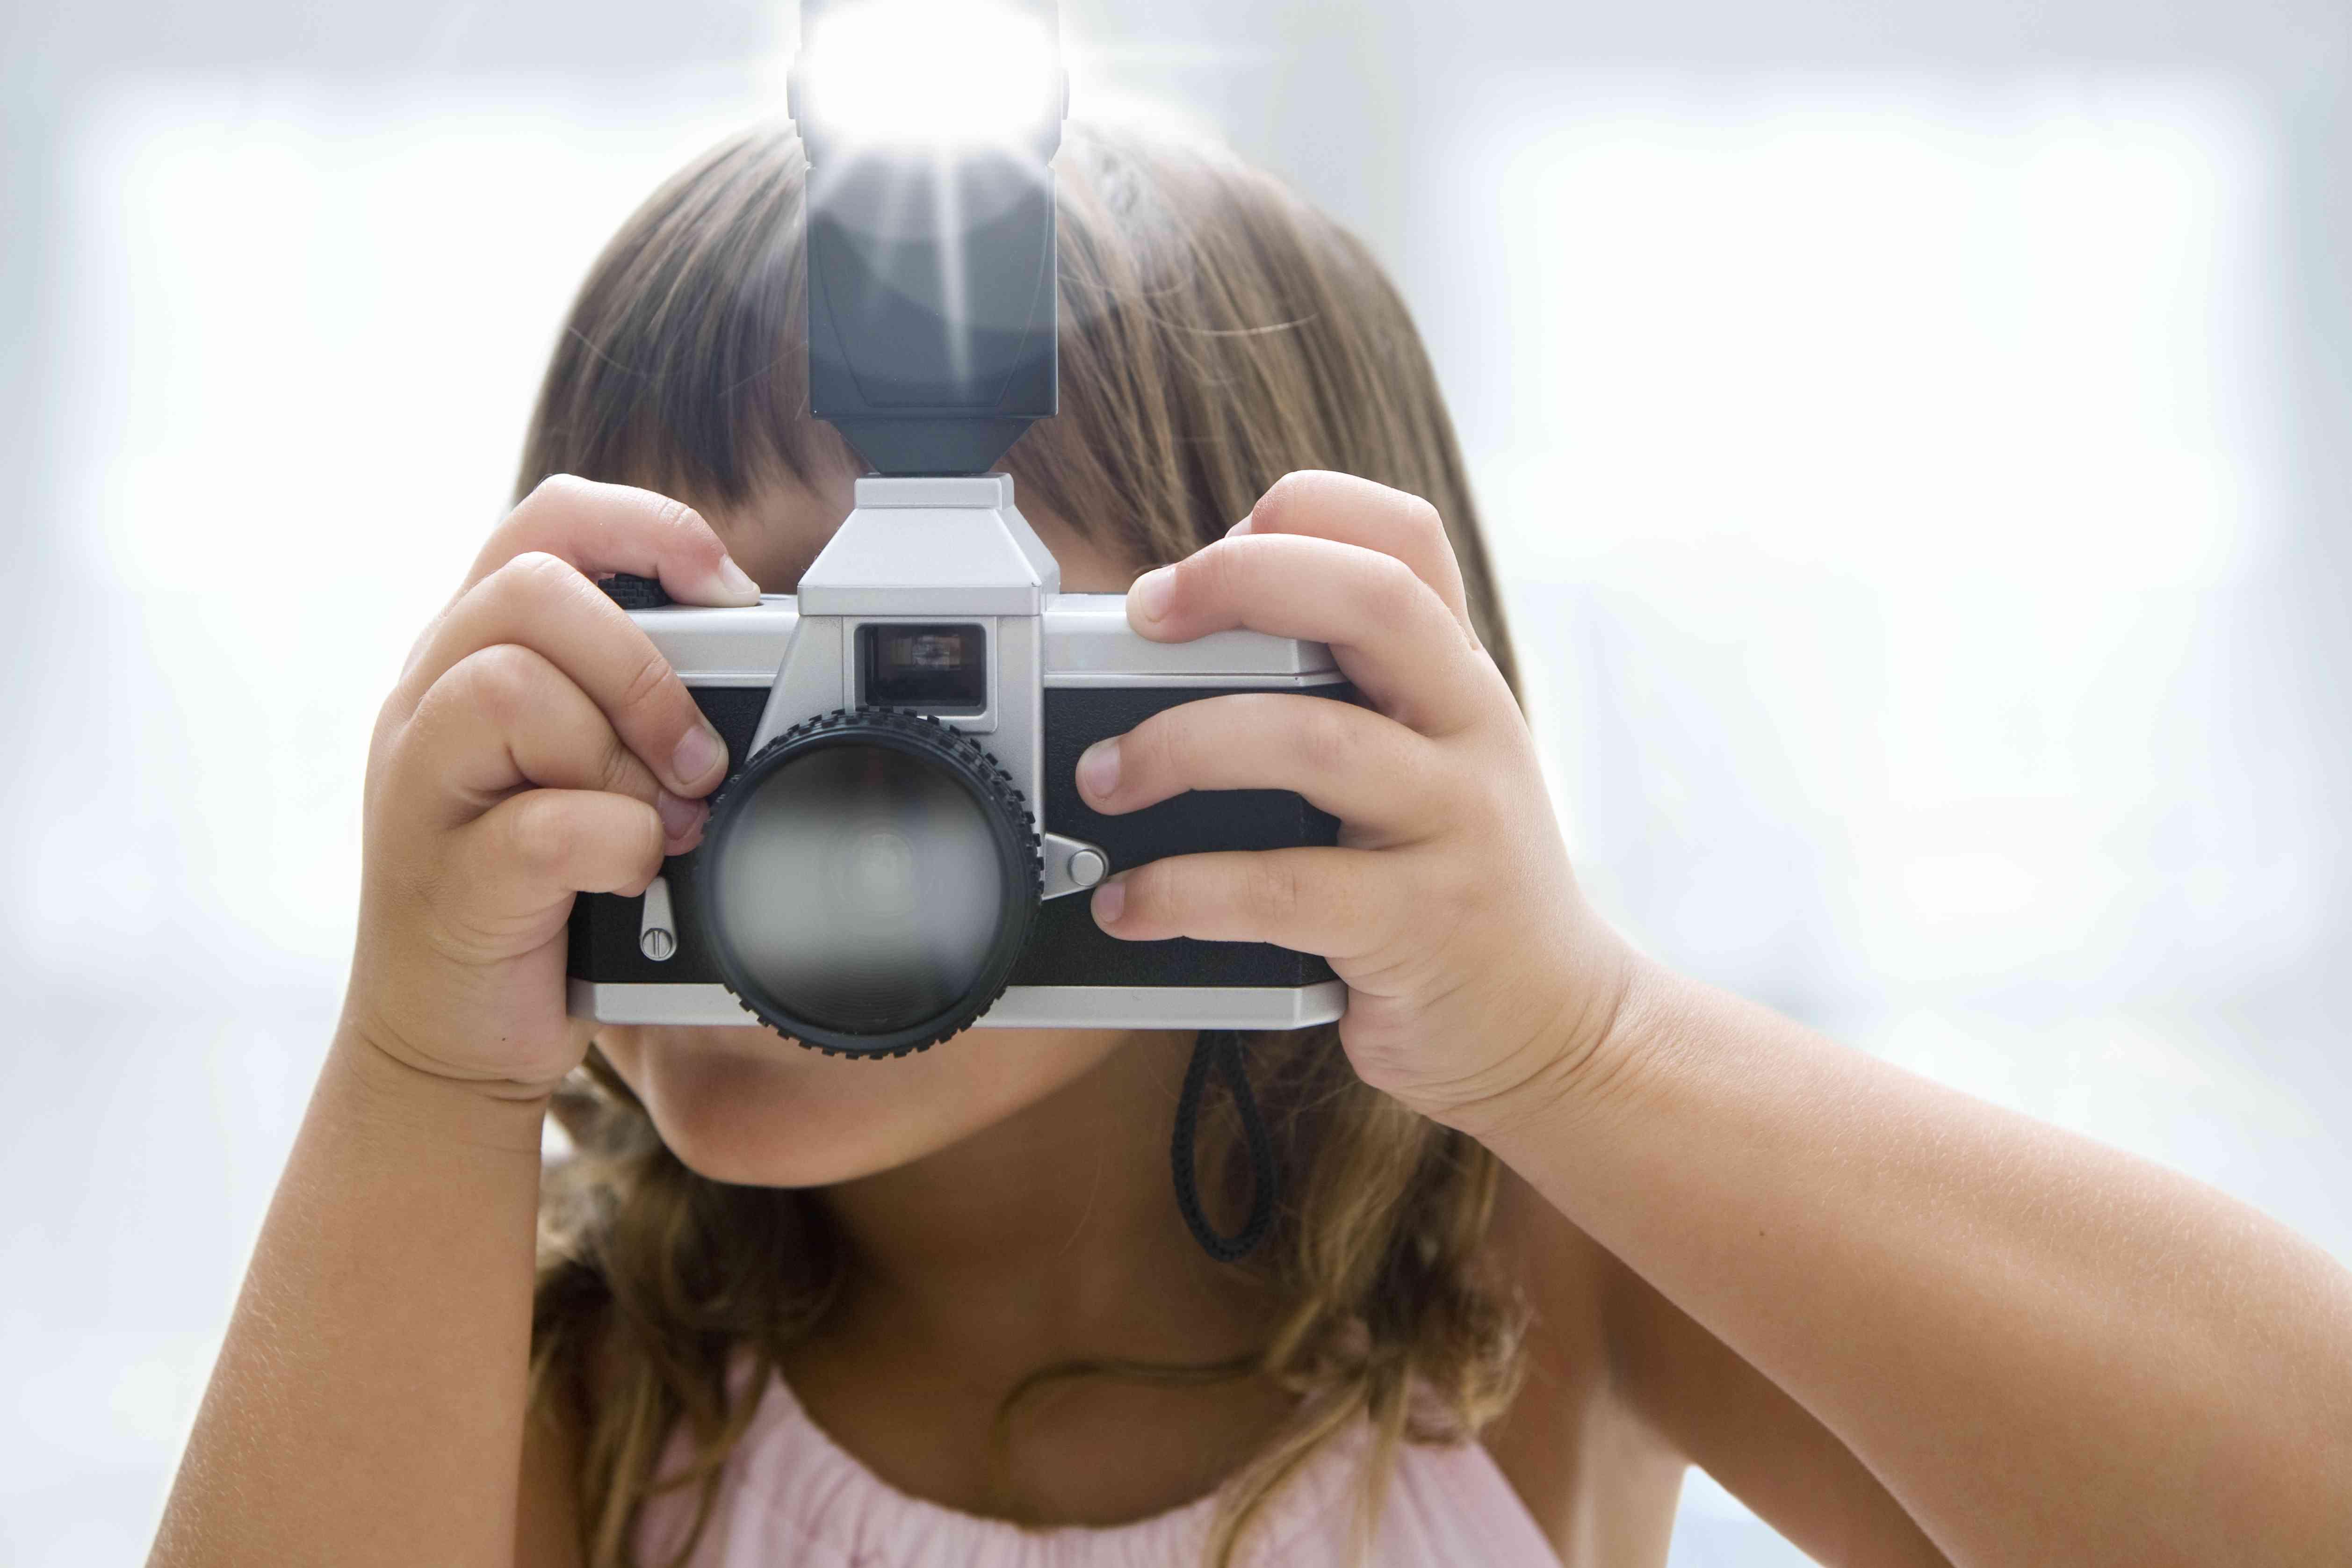 Girl using toy camera